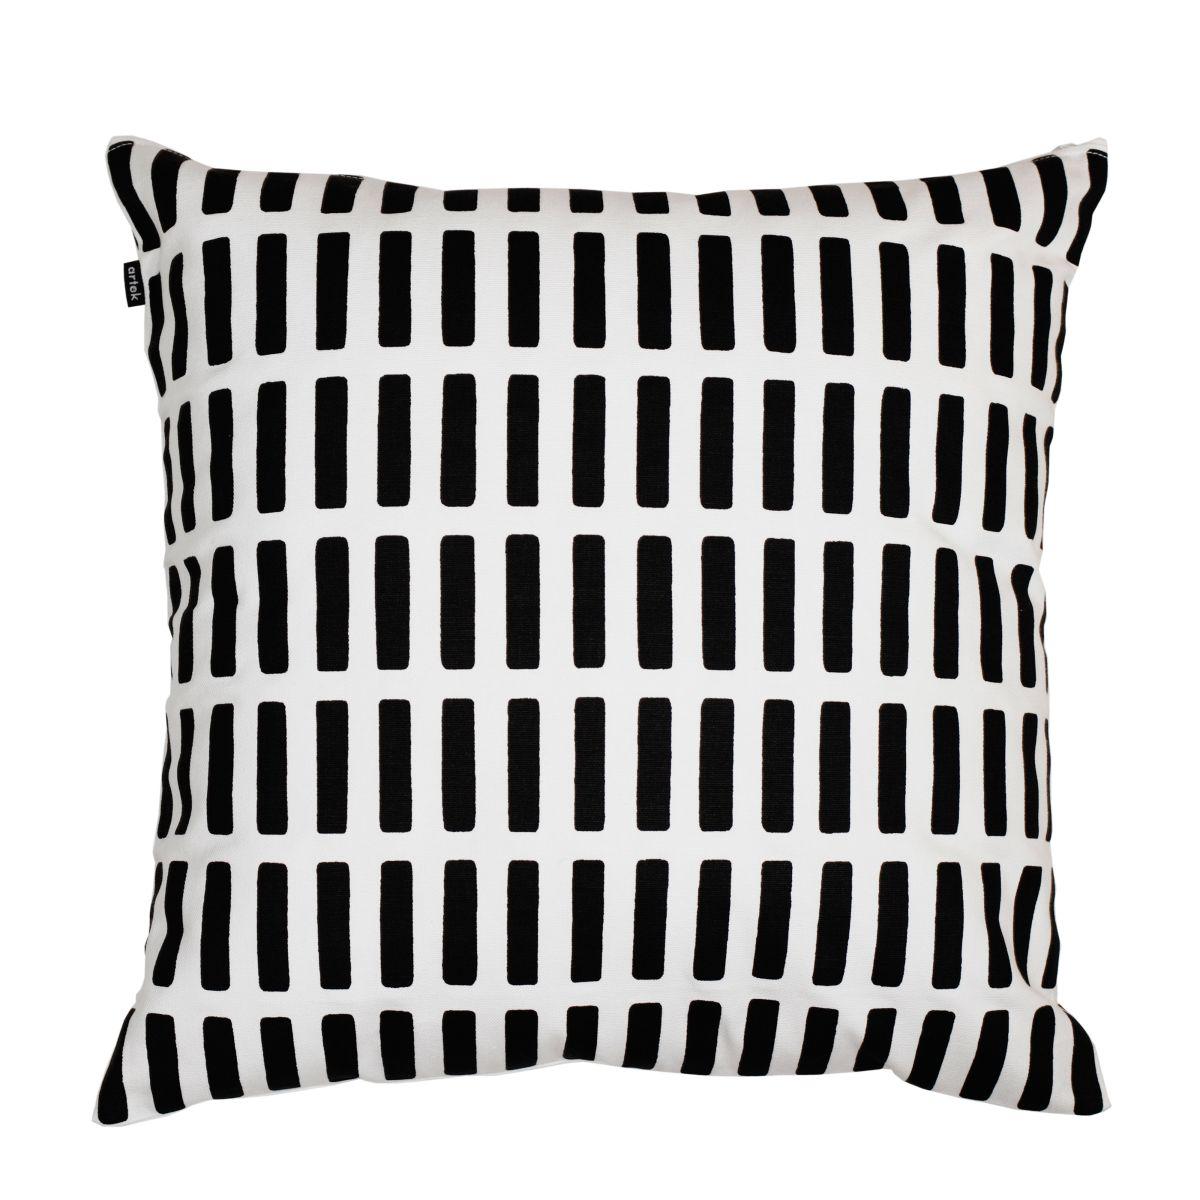 Siena-Cushion-Cover-White-Black